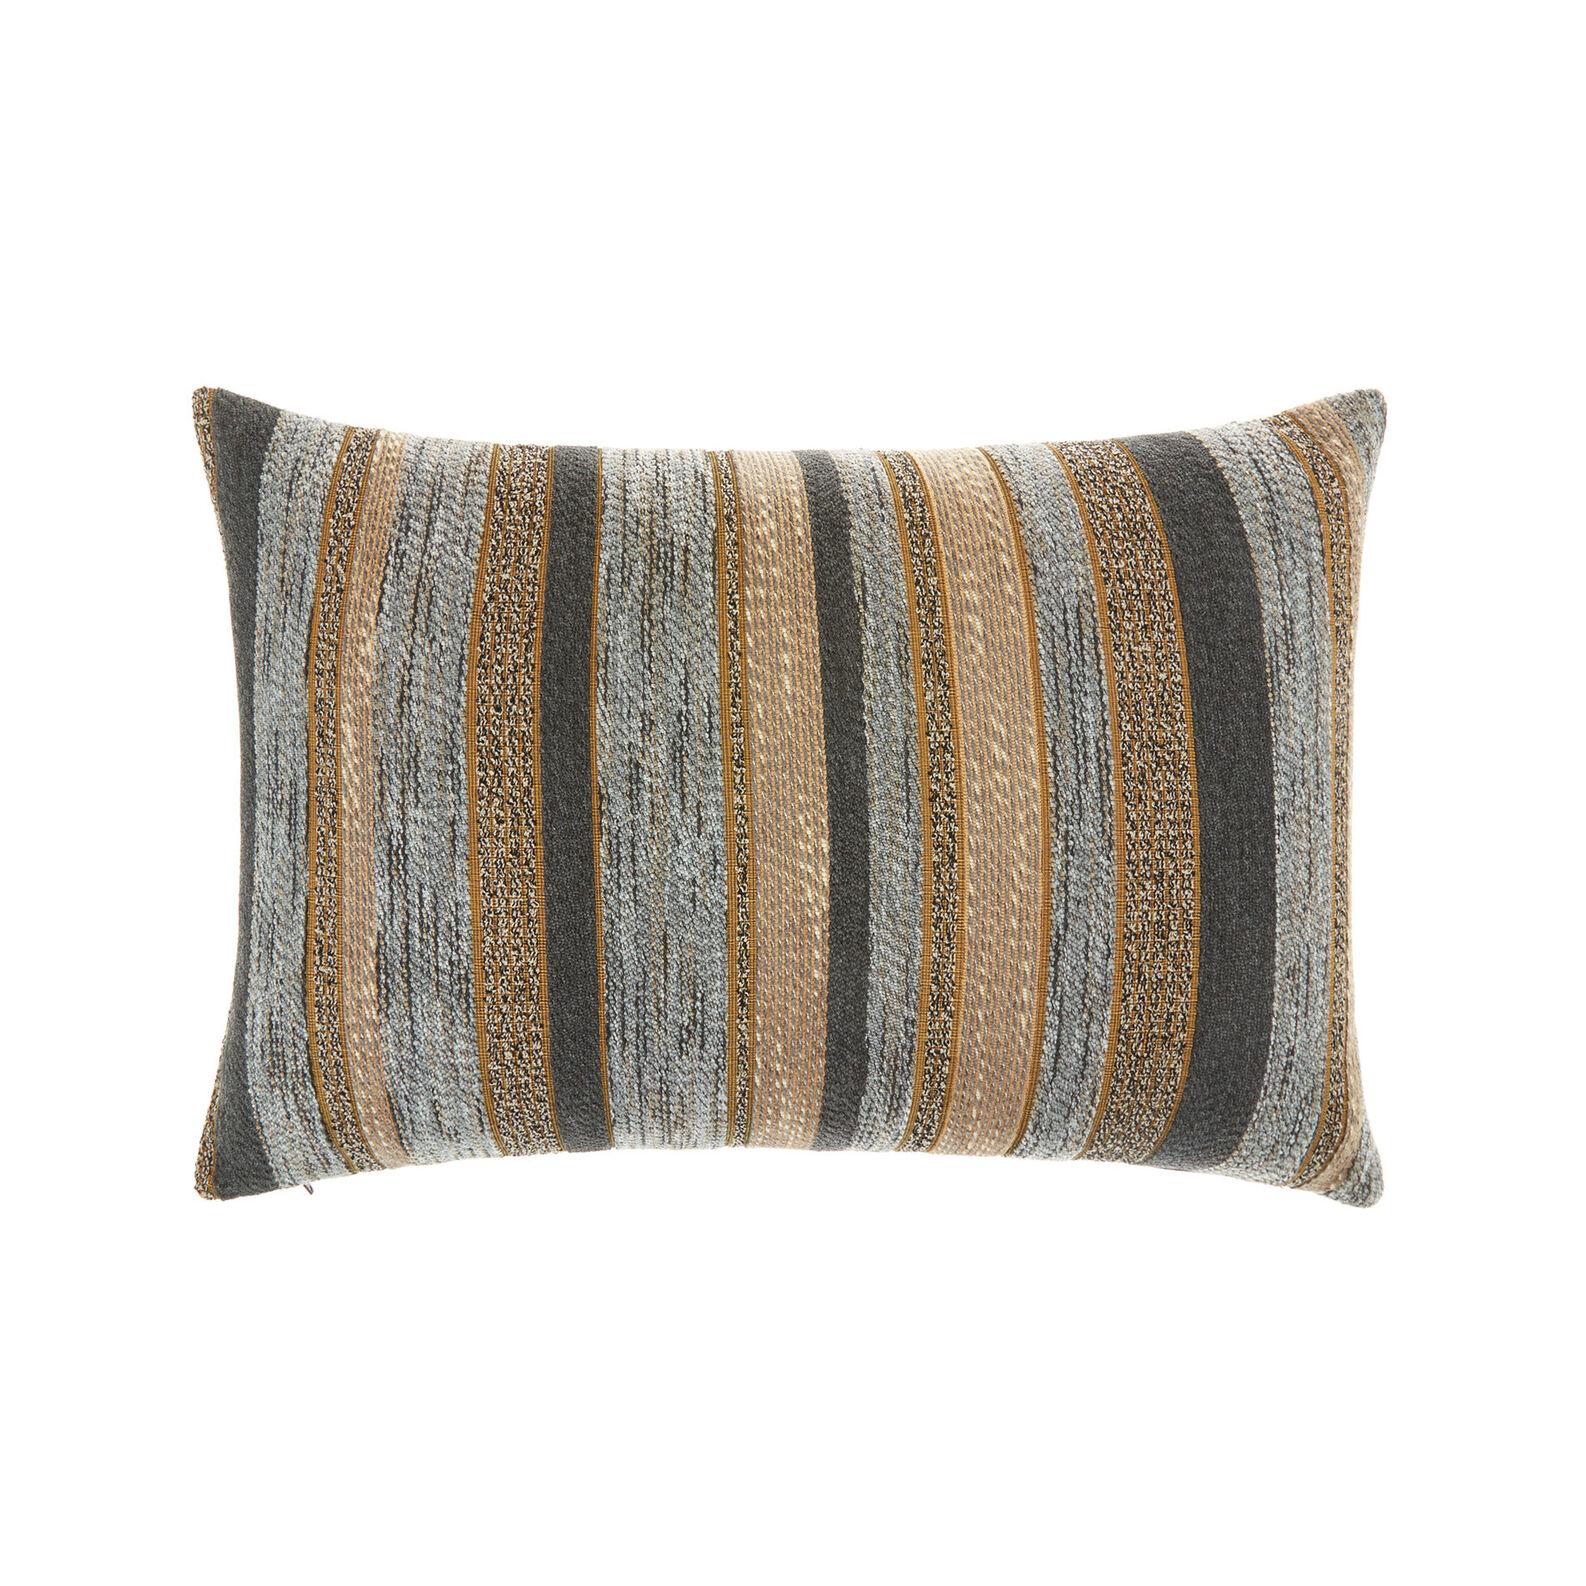 Jacquard weave cushion 35x55cm